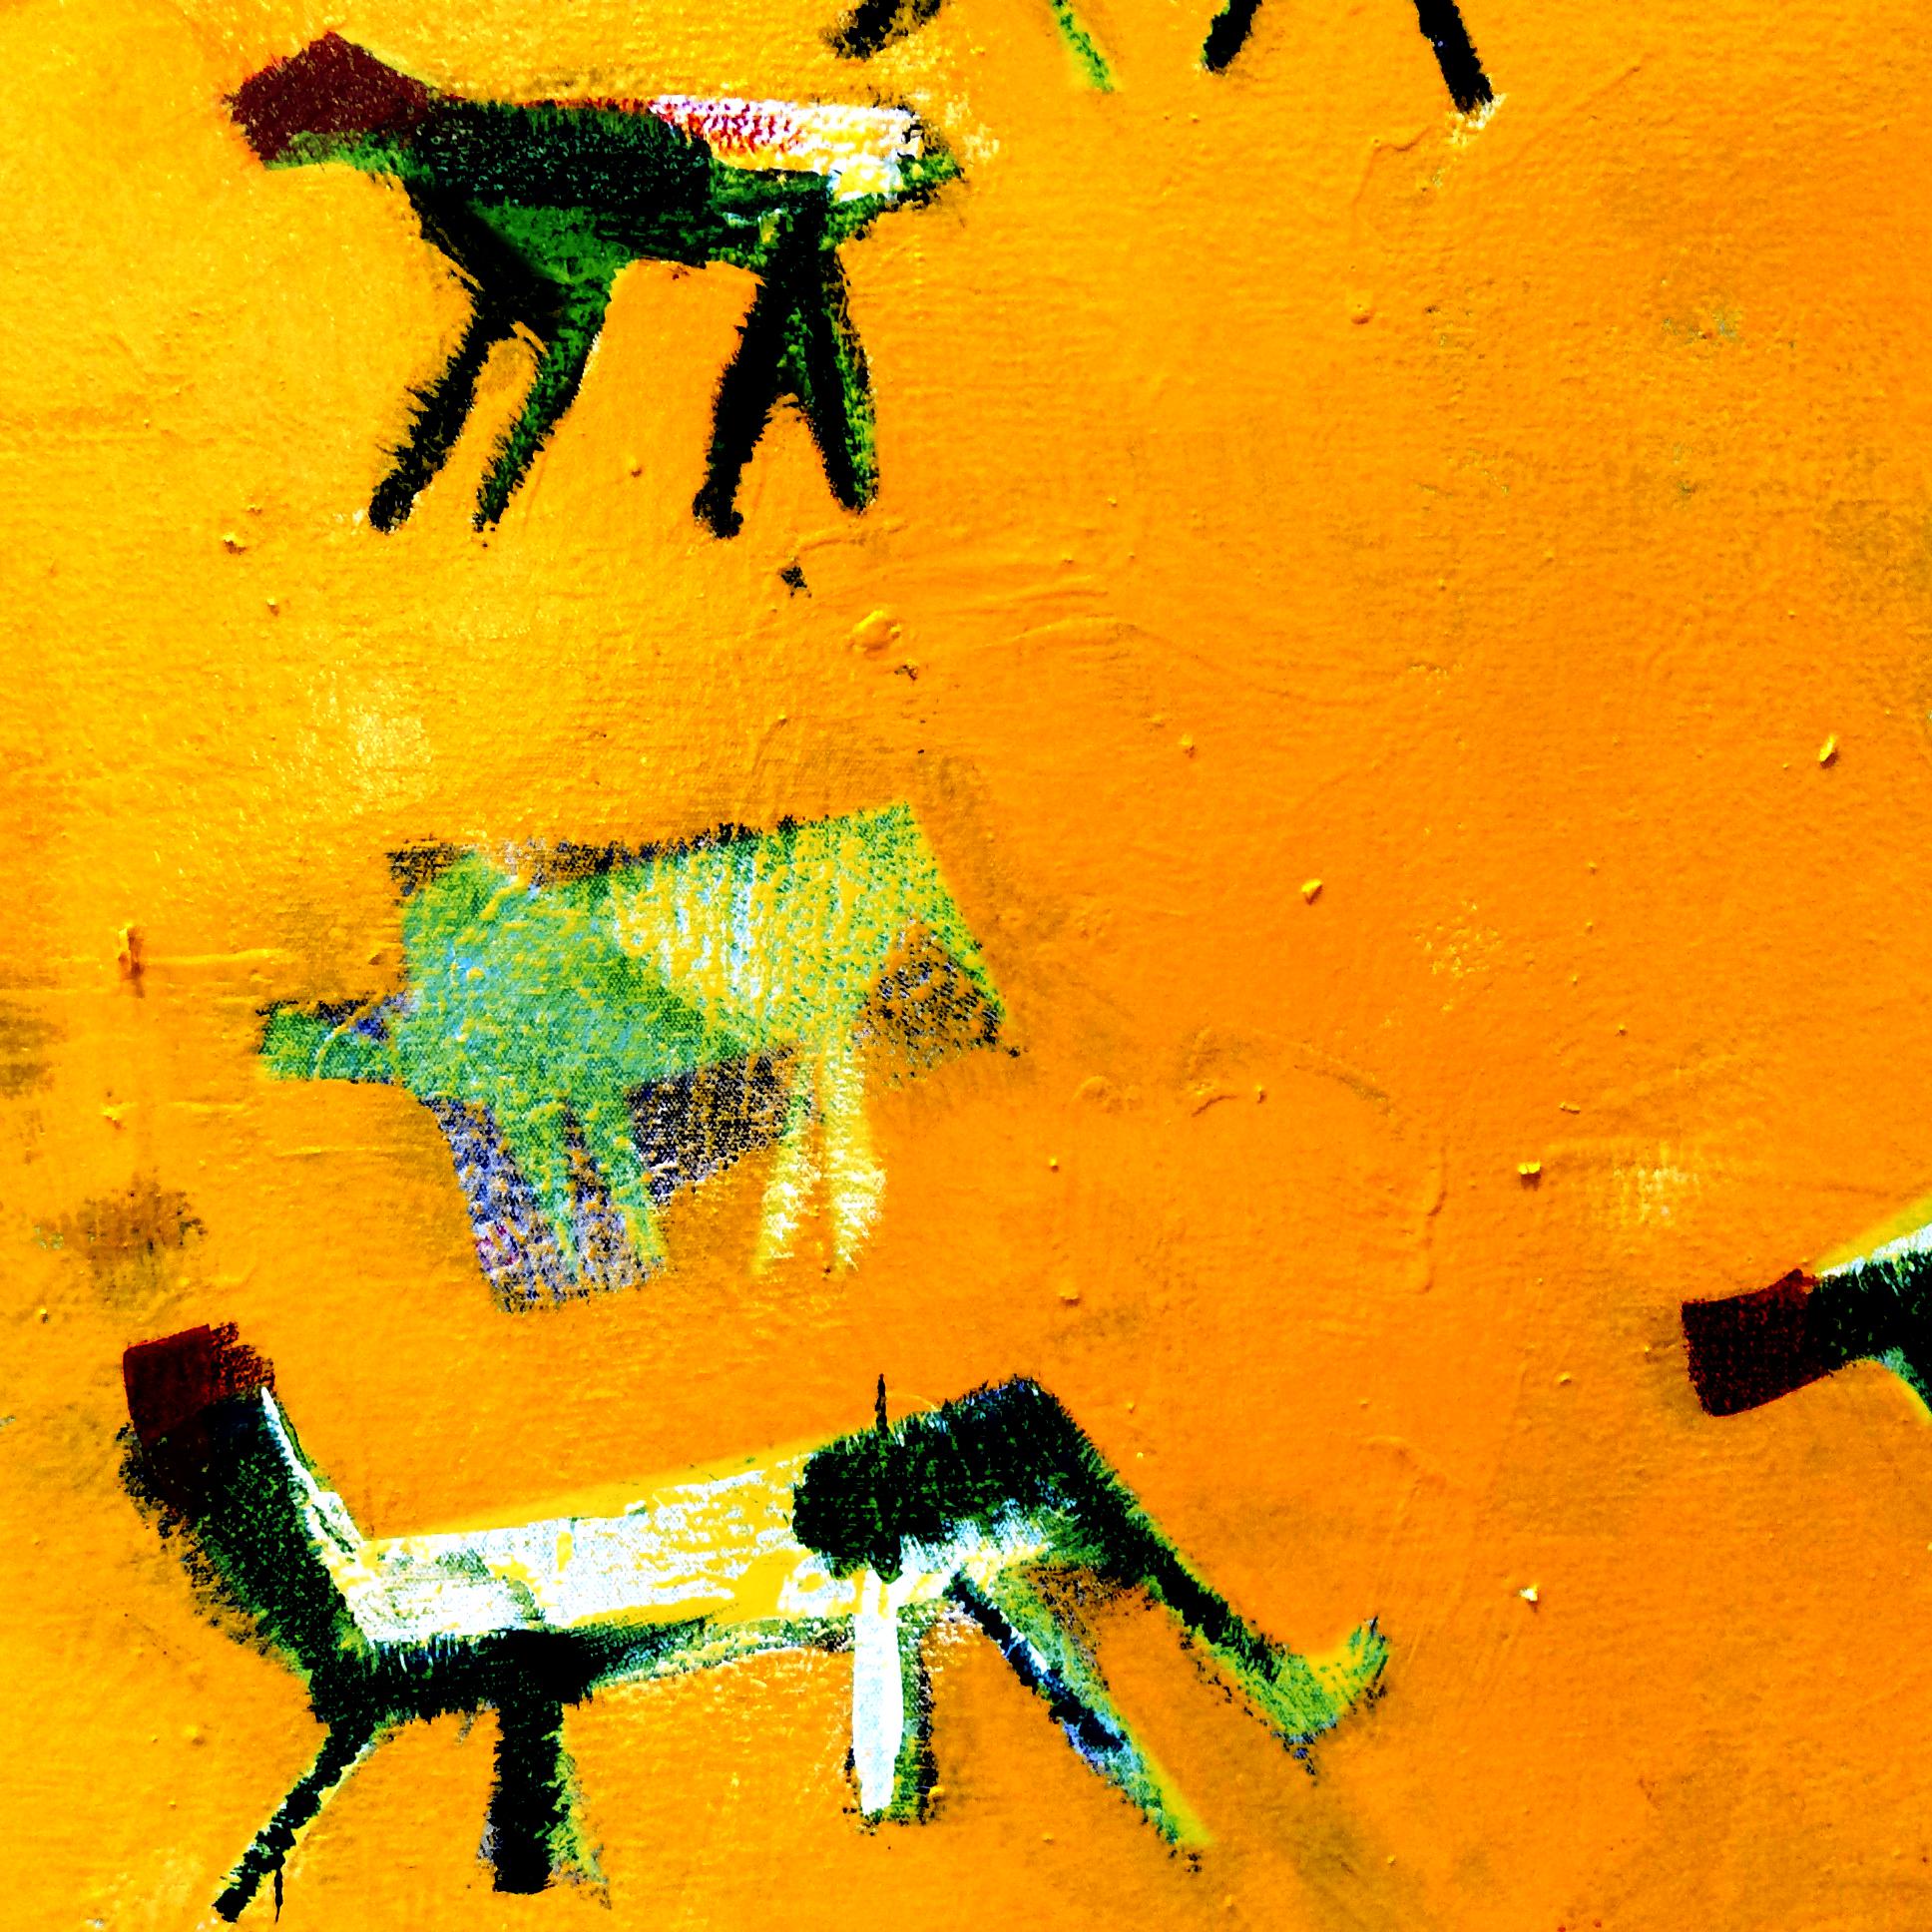 Cows_06.jpg